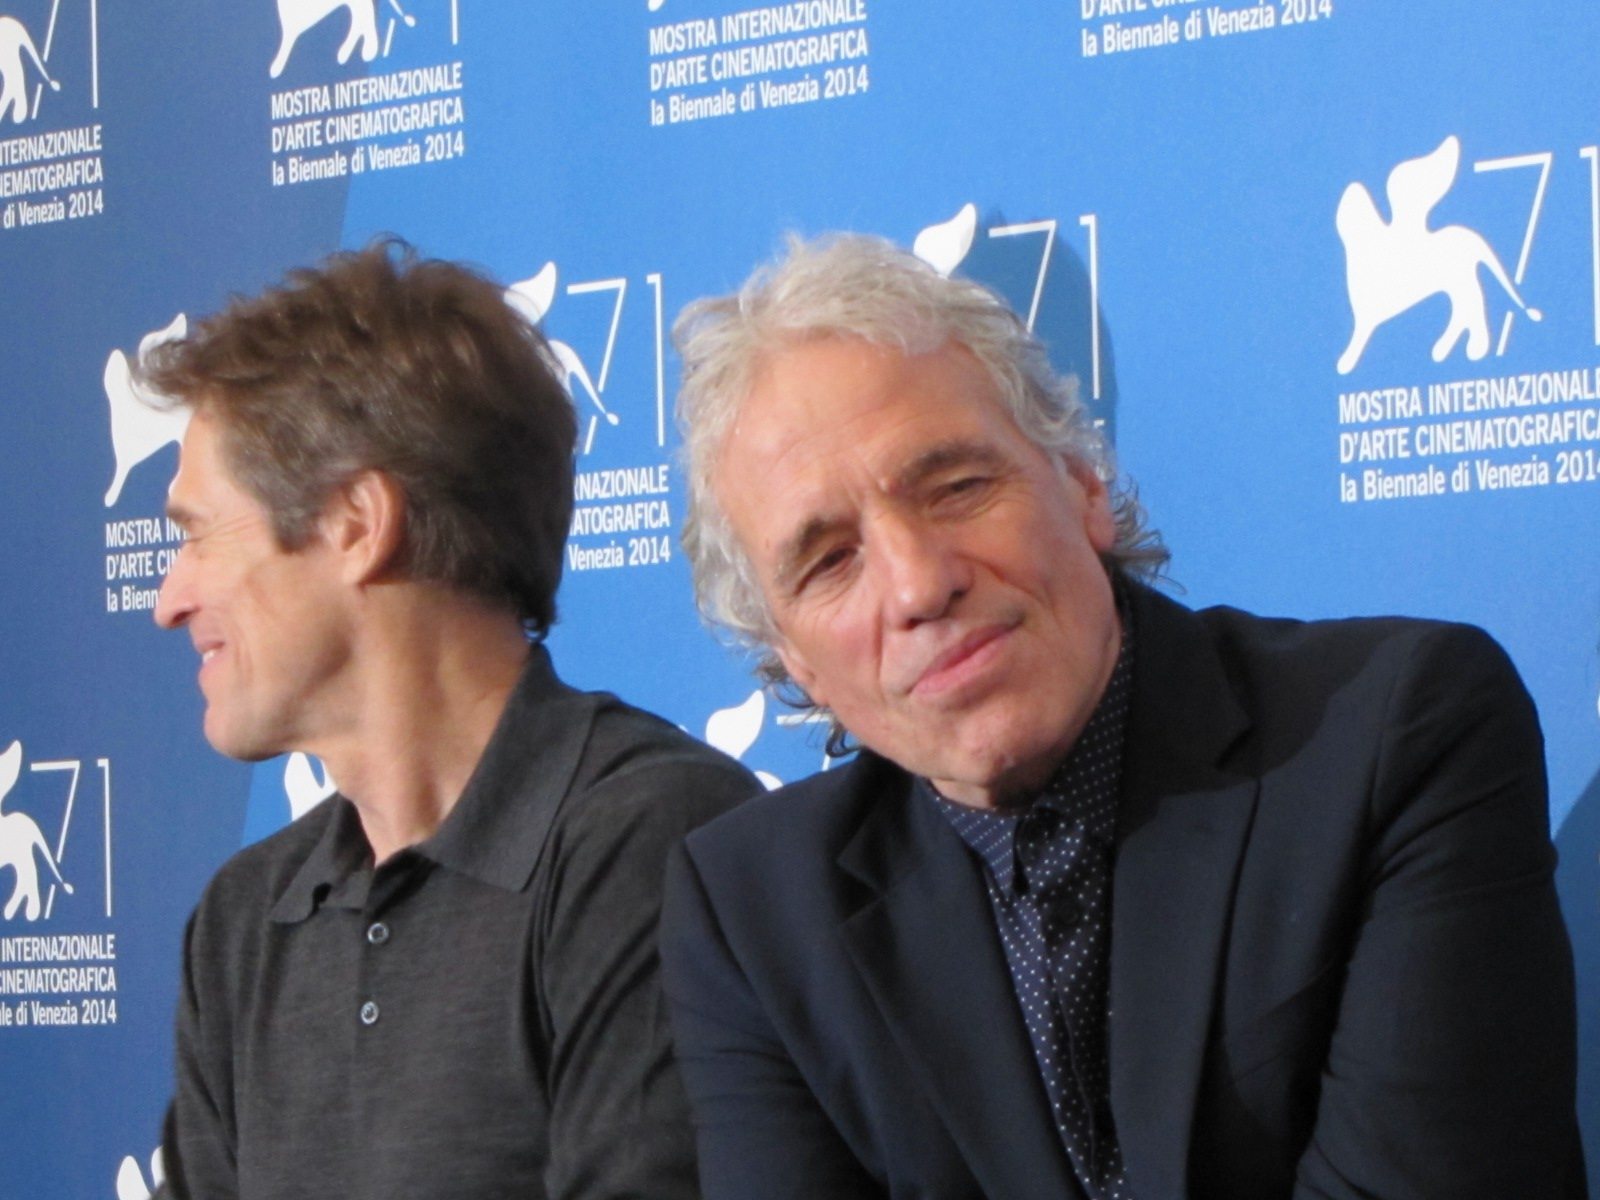 'Pasolini' a Venezia 2014 - Abel Ferrara accanto a Dafoe